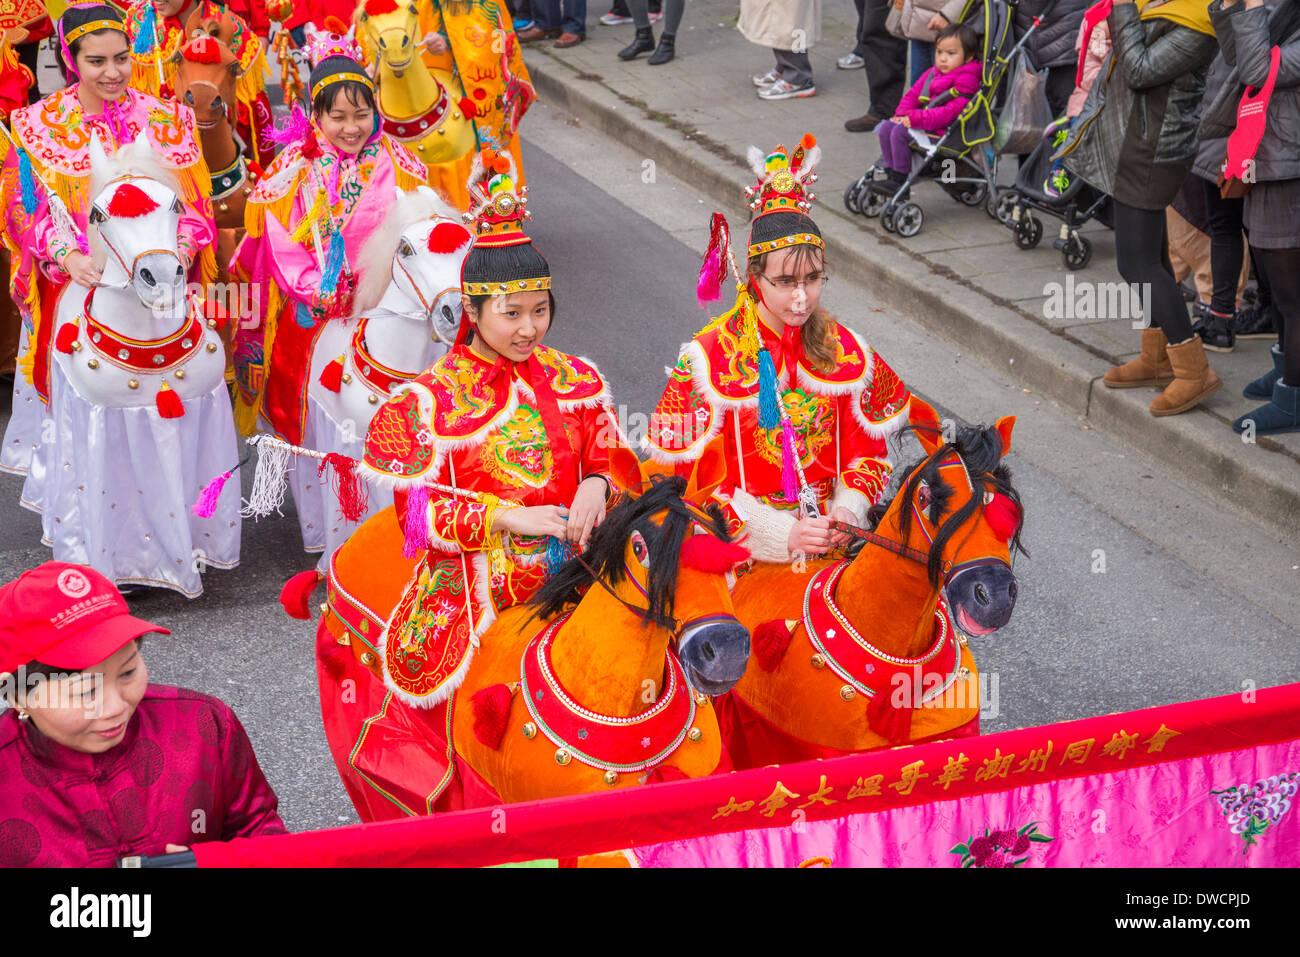 Année du cheval, Parade du Nouvel An Chinois, Vancouver, British Columbia, Canada Photo Stock